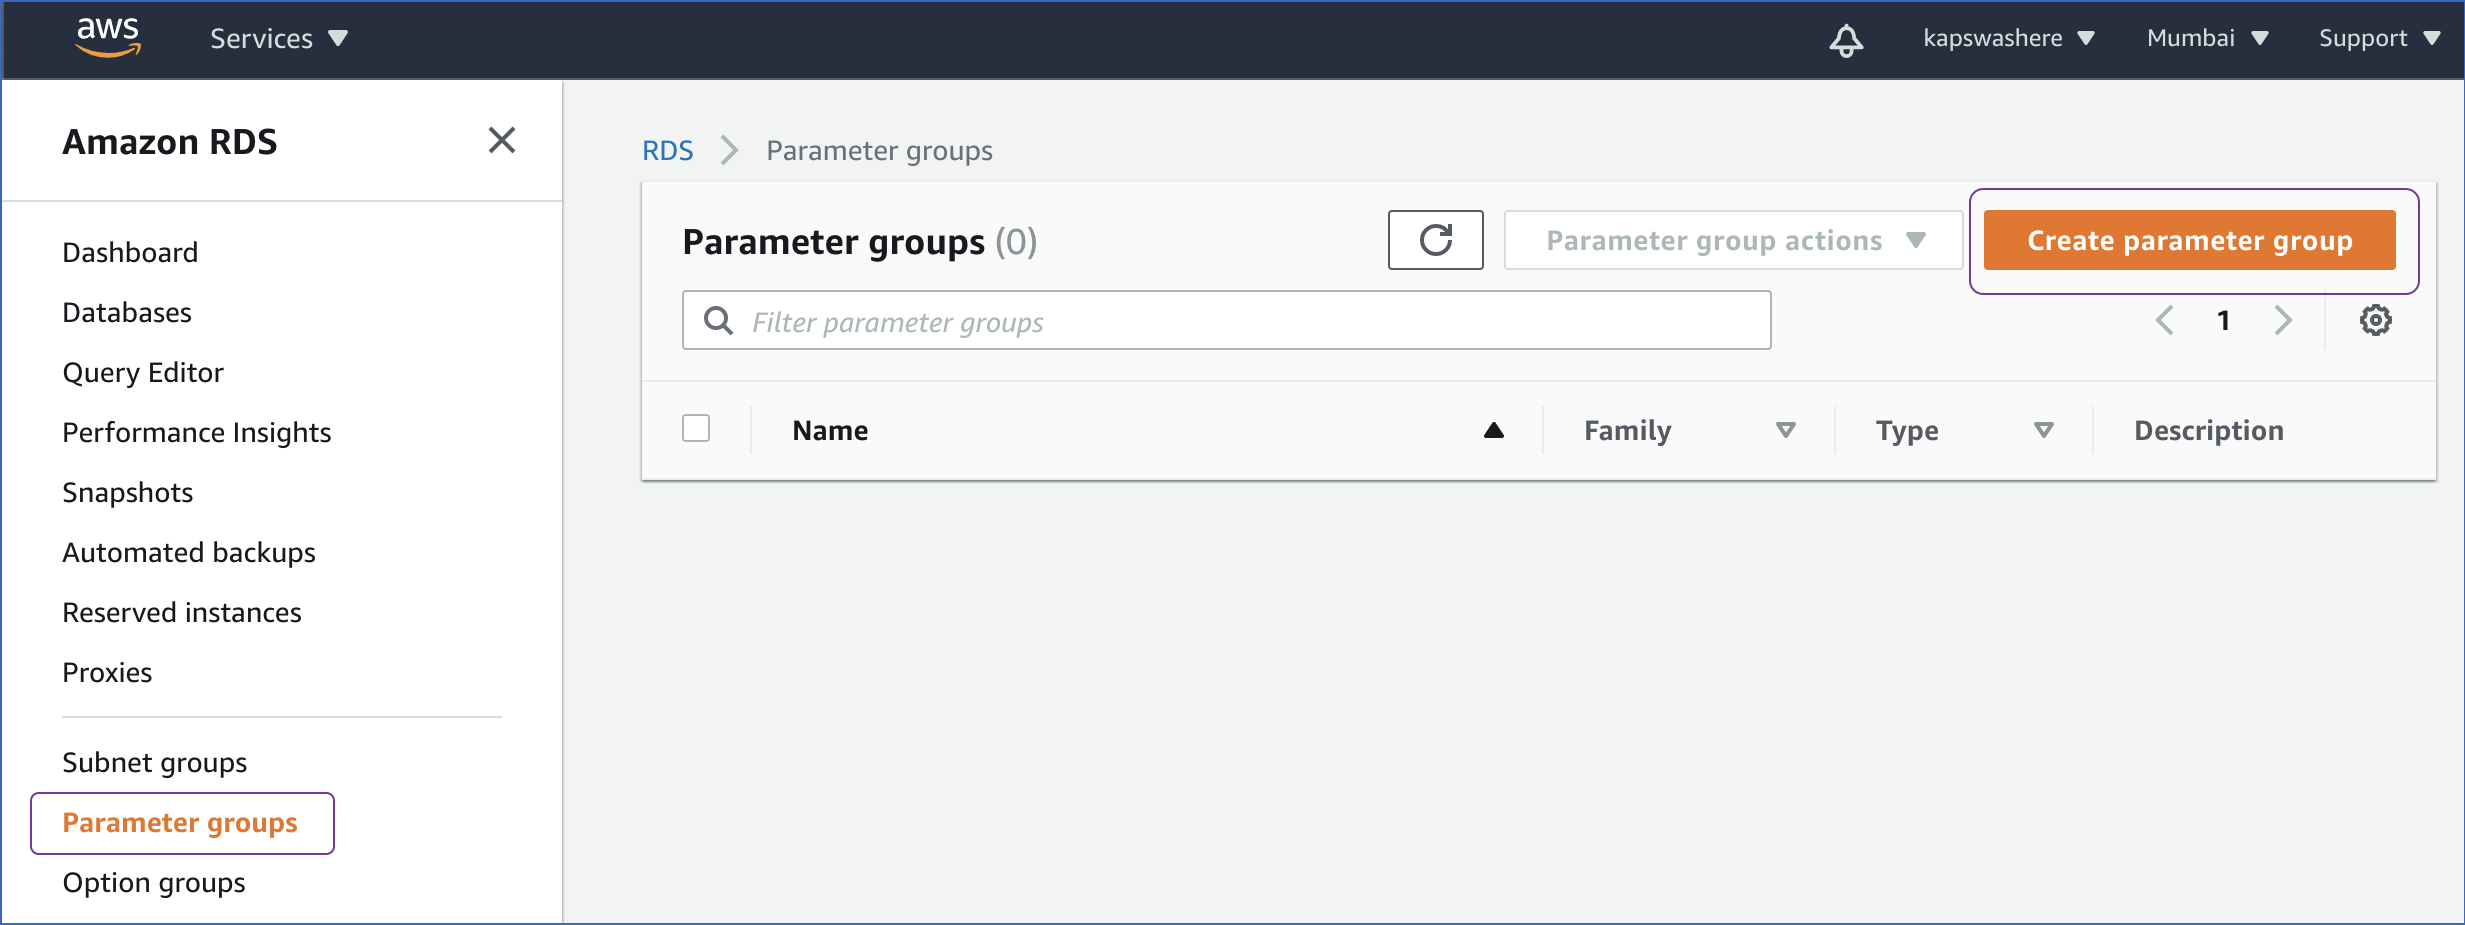 Parameter groups